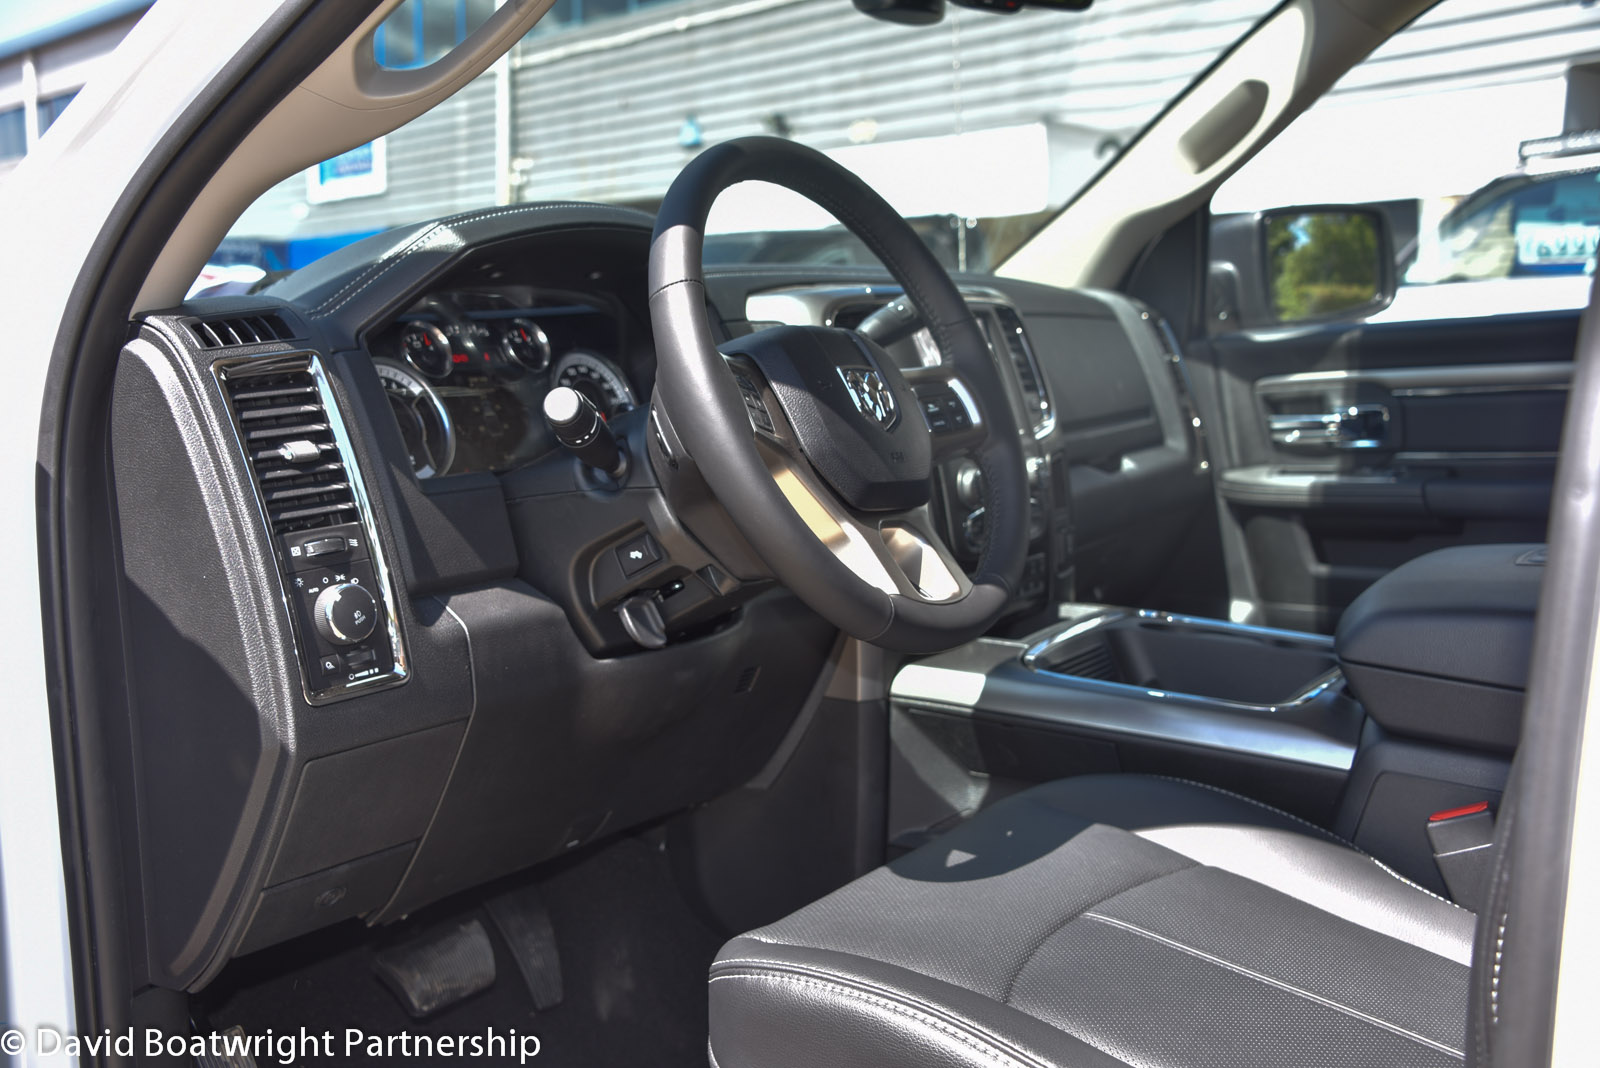 2018 Dodge Ram 2500 HD 4x4